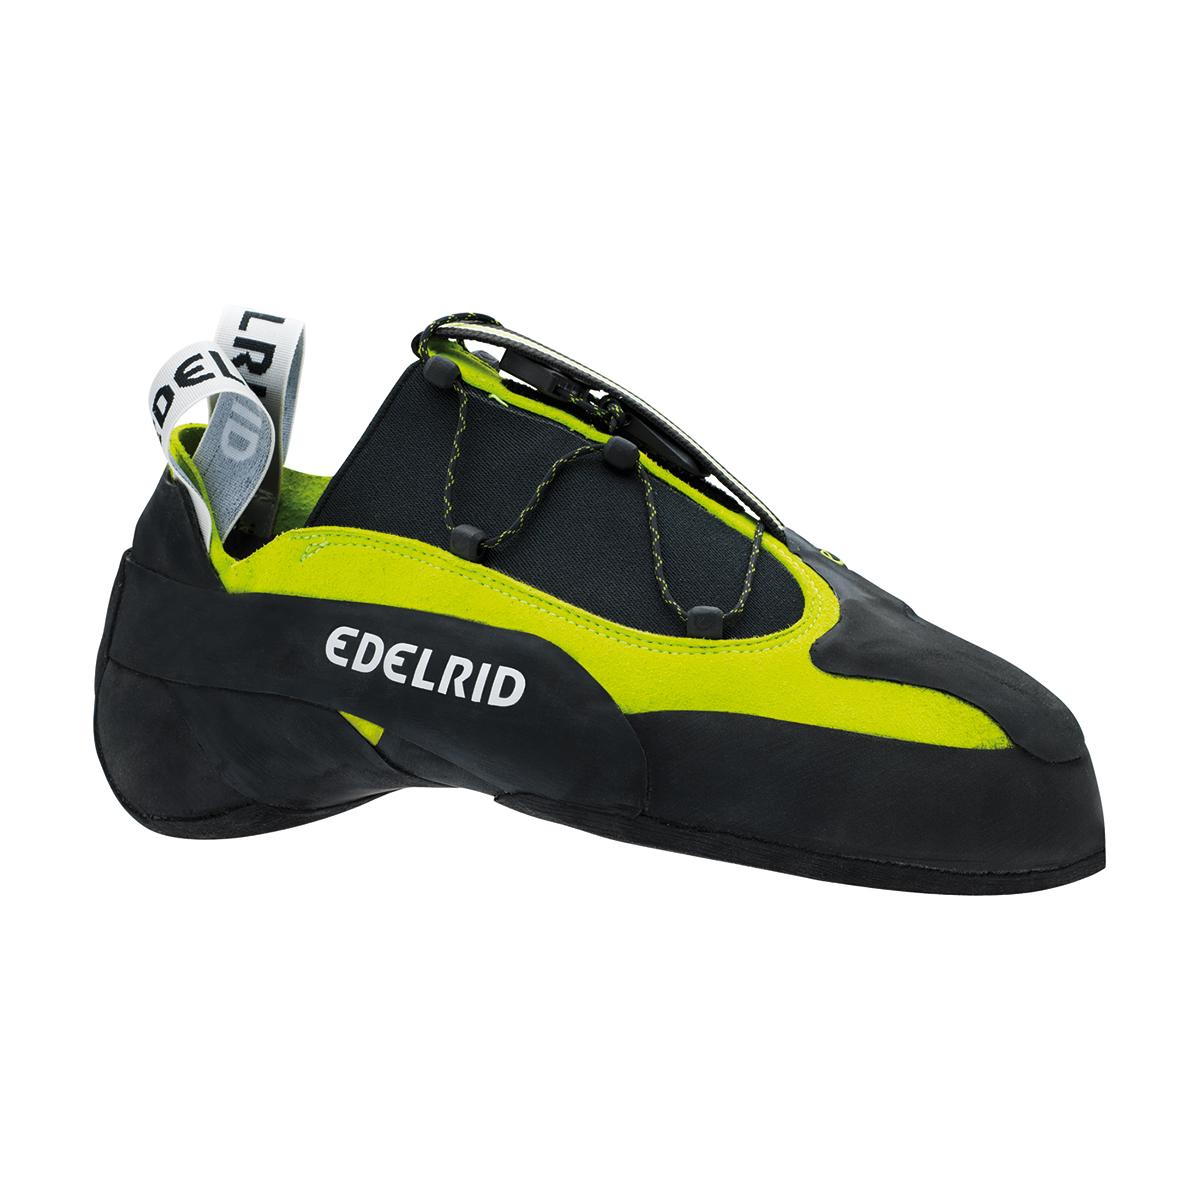 3b150f172ed7 Edelrid Cyclone | Climbing Shoes | EpicTV Shop